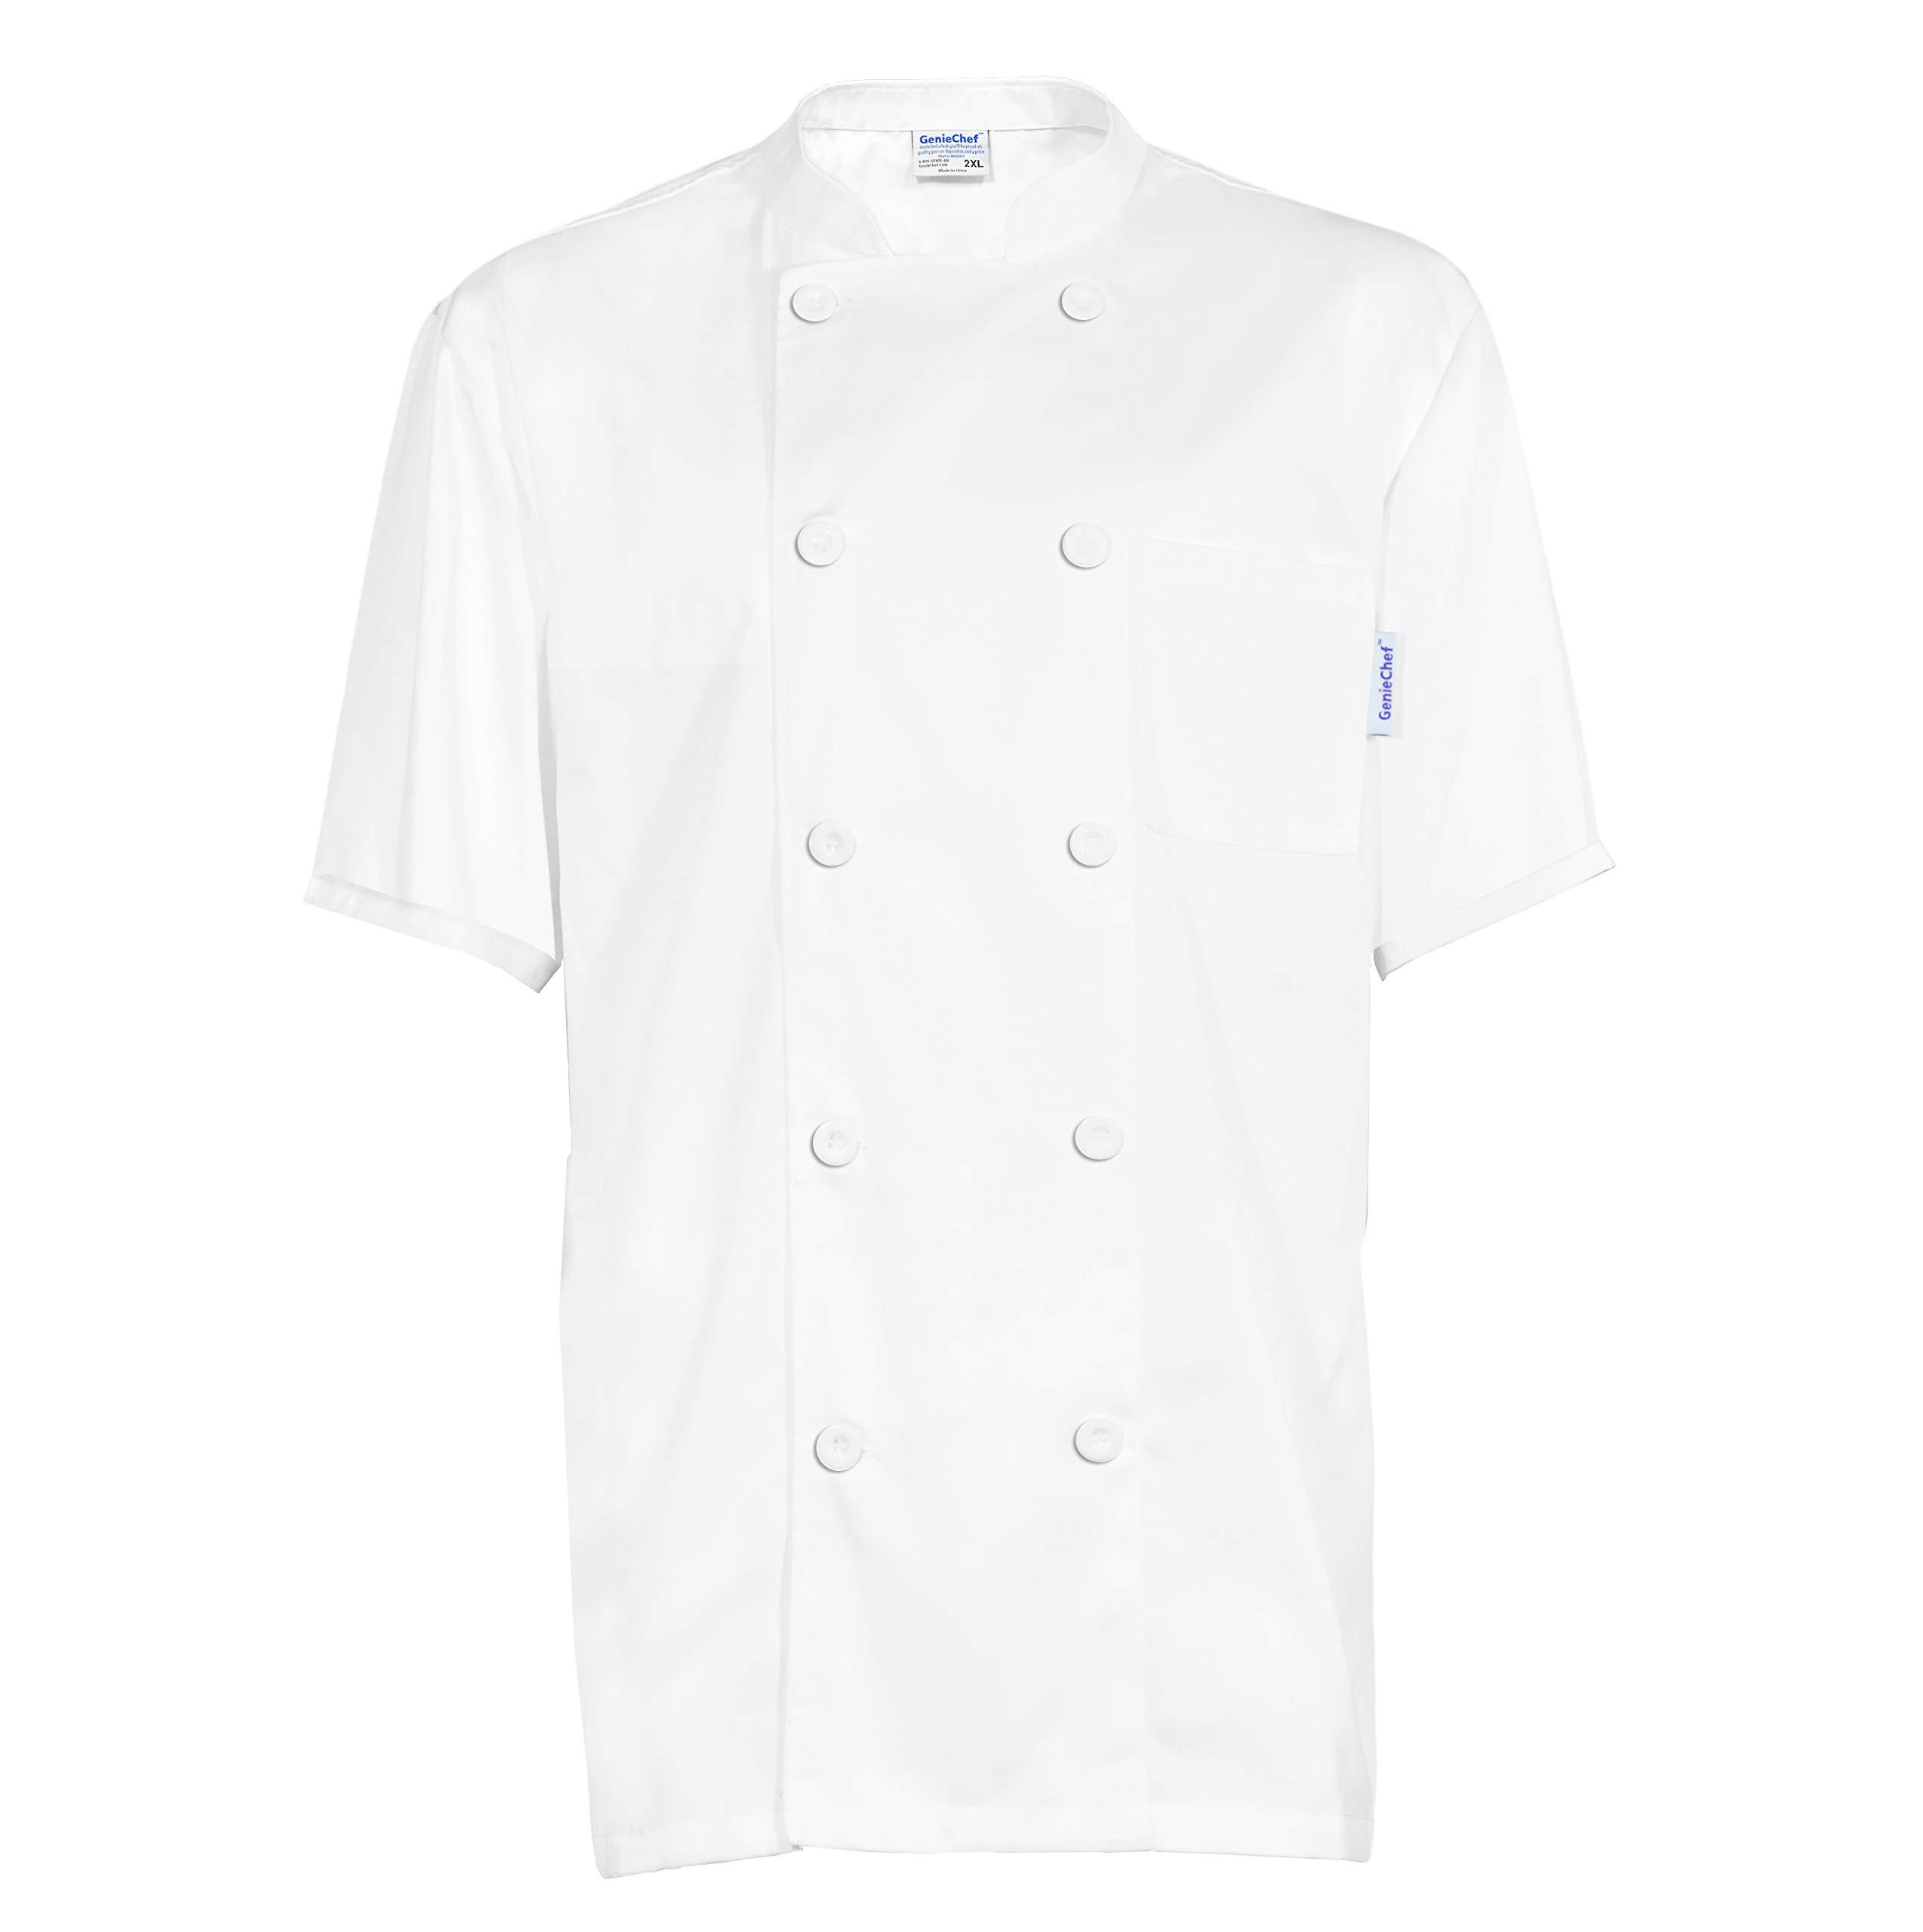 GenieChef Men's Short Sleeve Classic Chef Coat X-L White